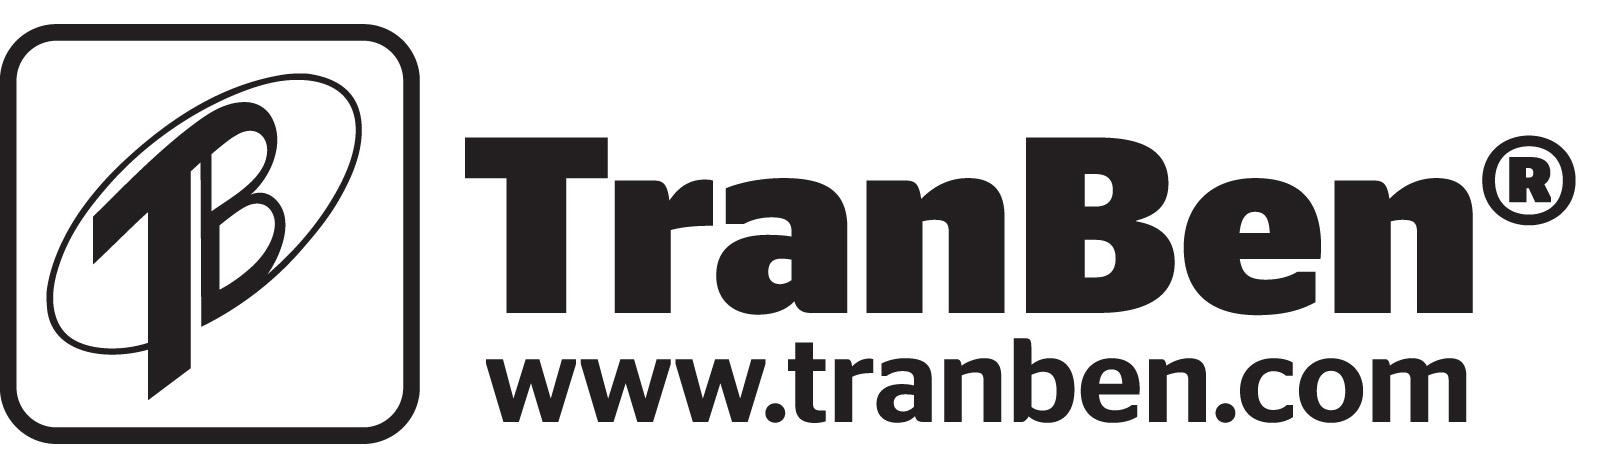 tranben_logo_02.jpg